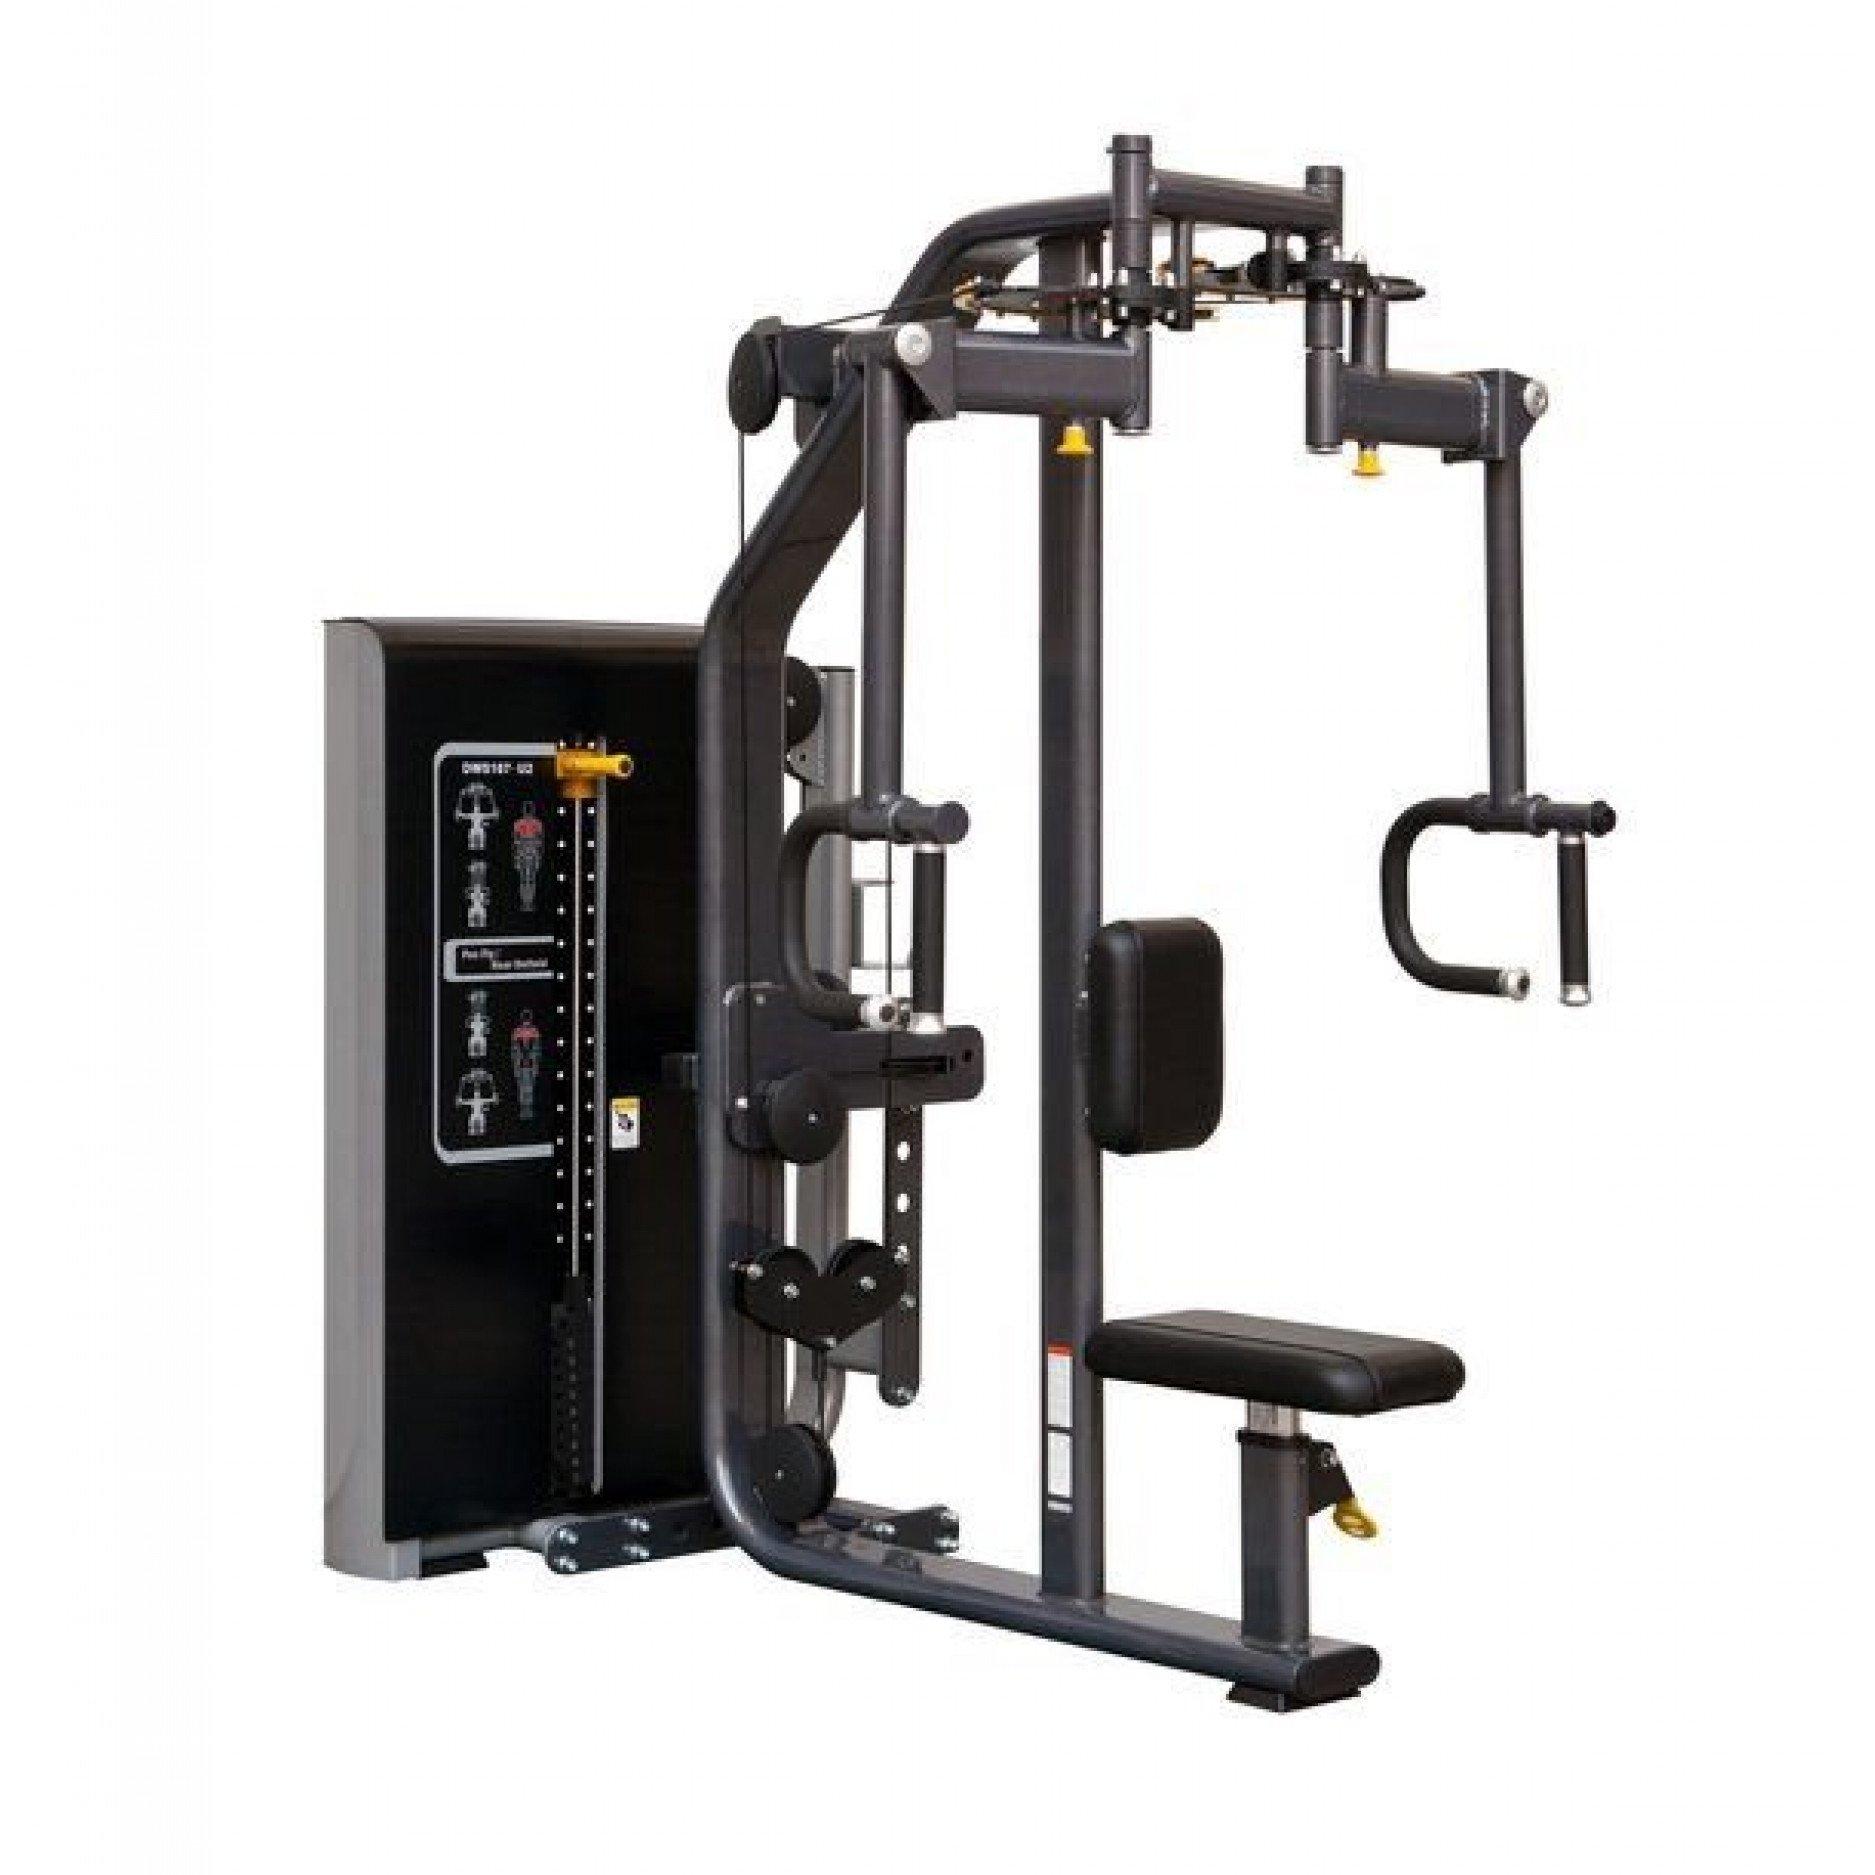 Баттерфляй / Задняя дельта Spirit Fitness DWS107-U2